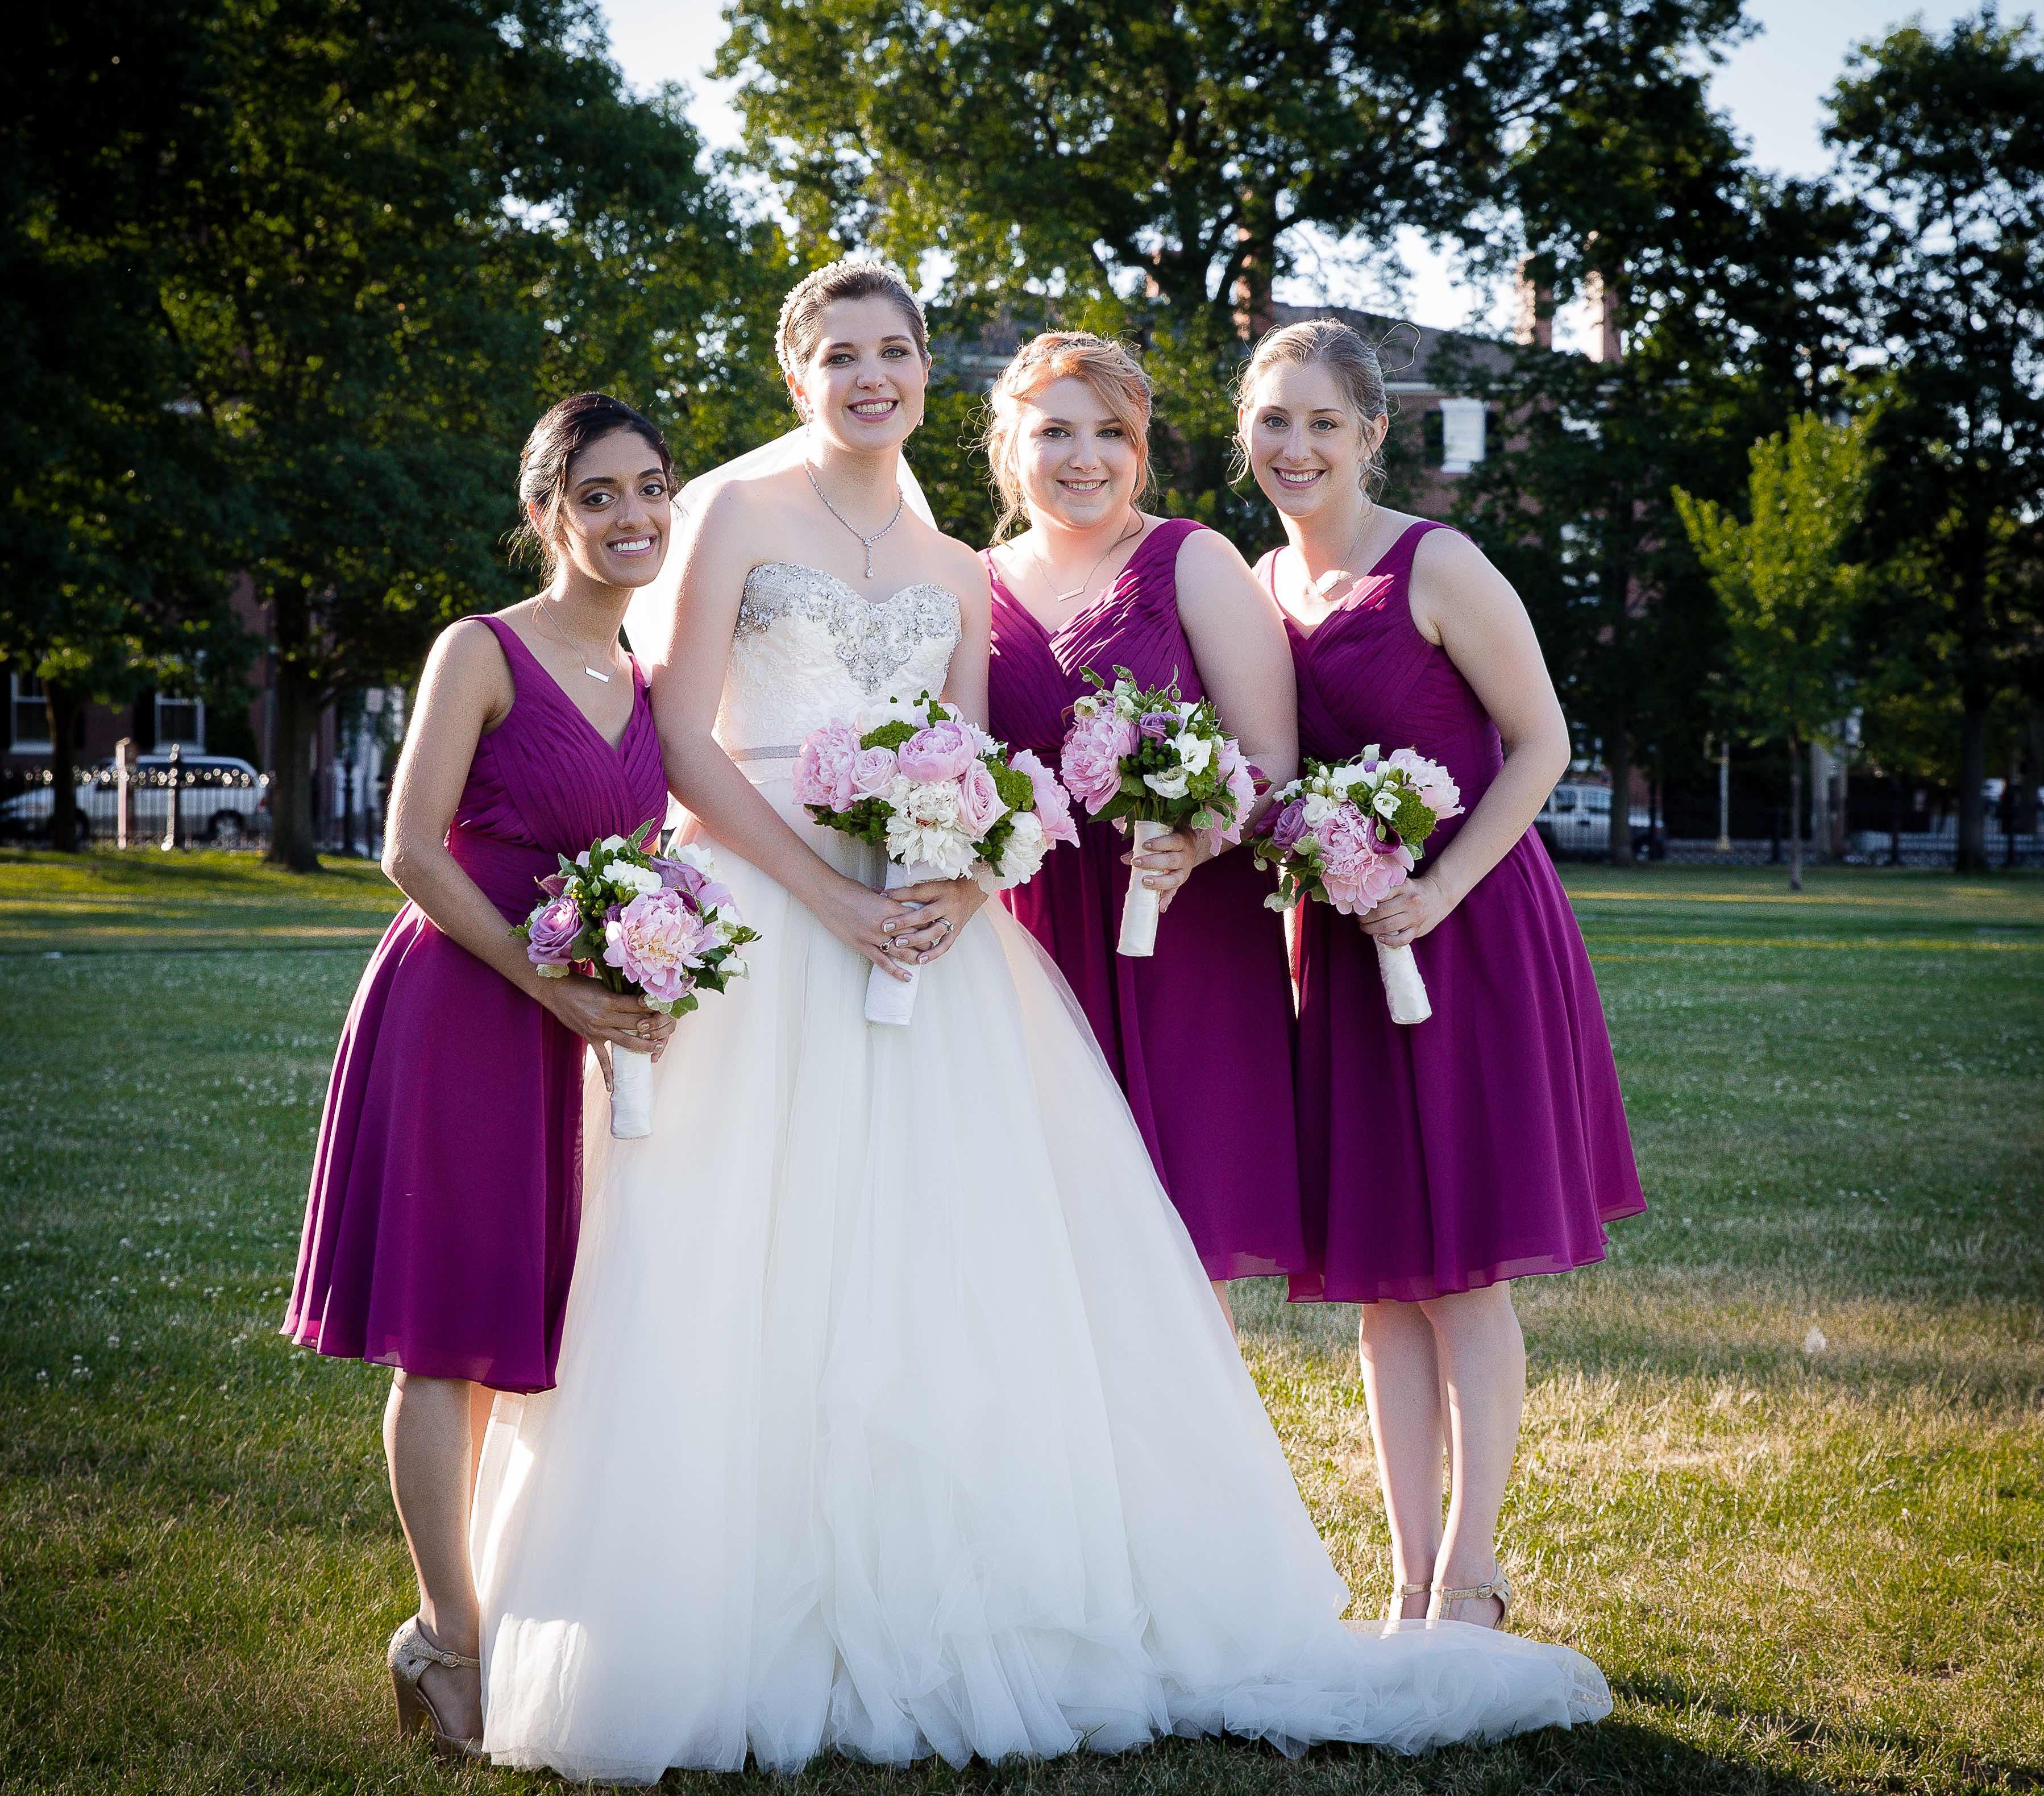 045fa7781c Azazie Wisteria Bridesmaid Dresses – Fashion dresses